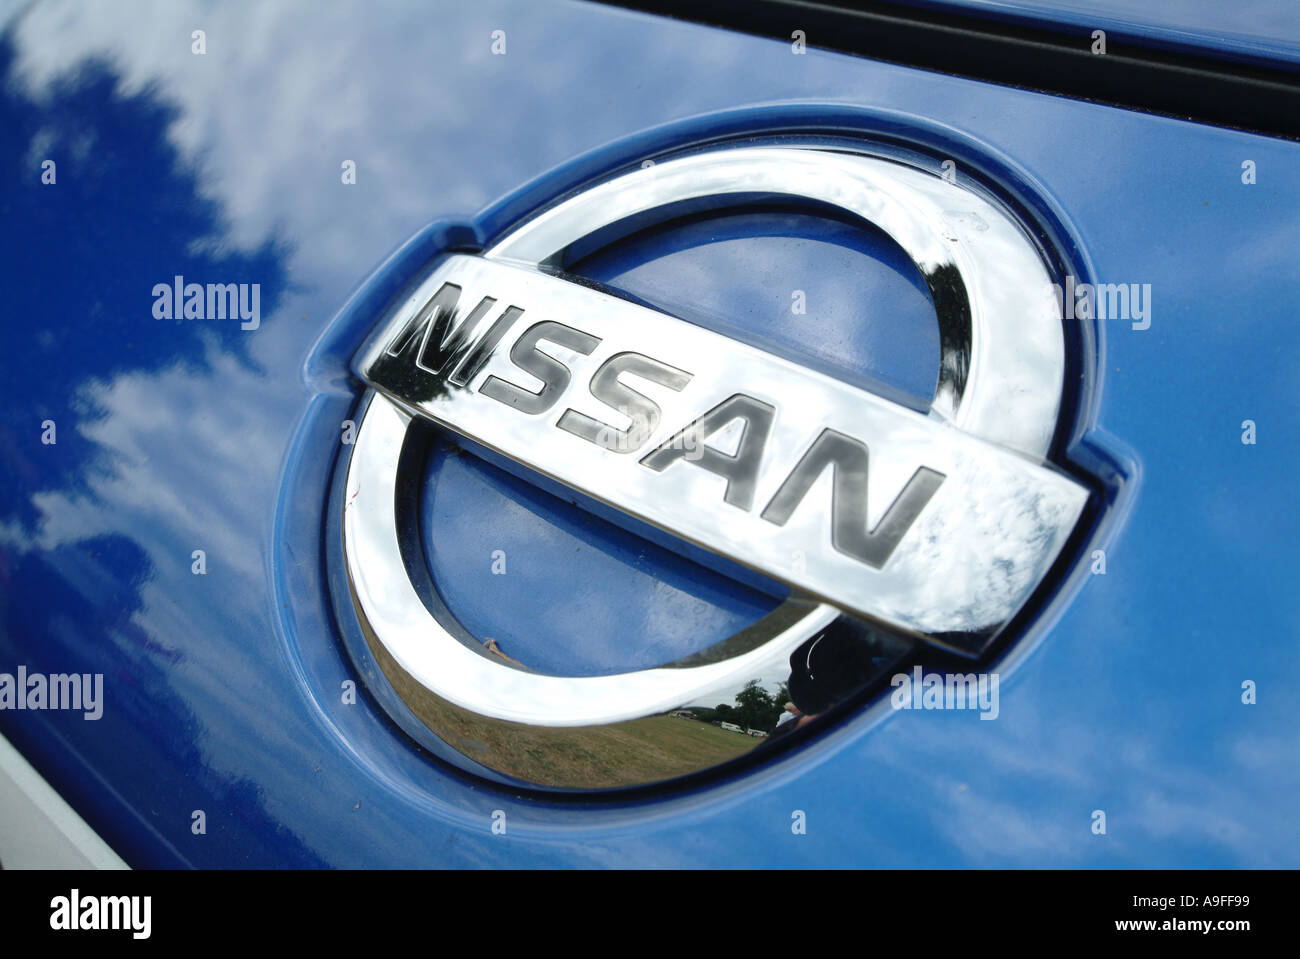 japan car maker manufacturer nissan datsun New car Finance dealer ...